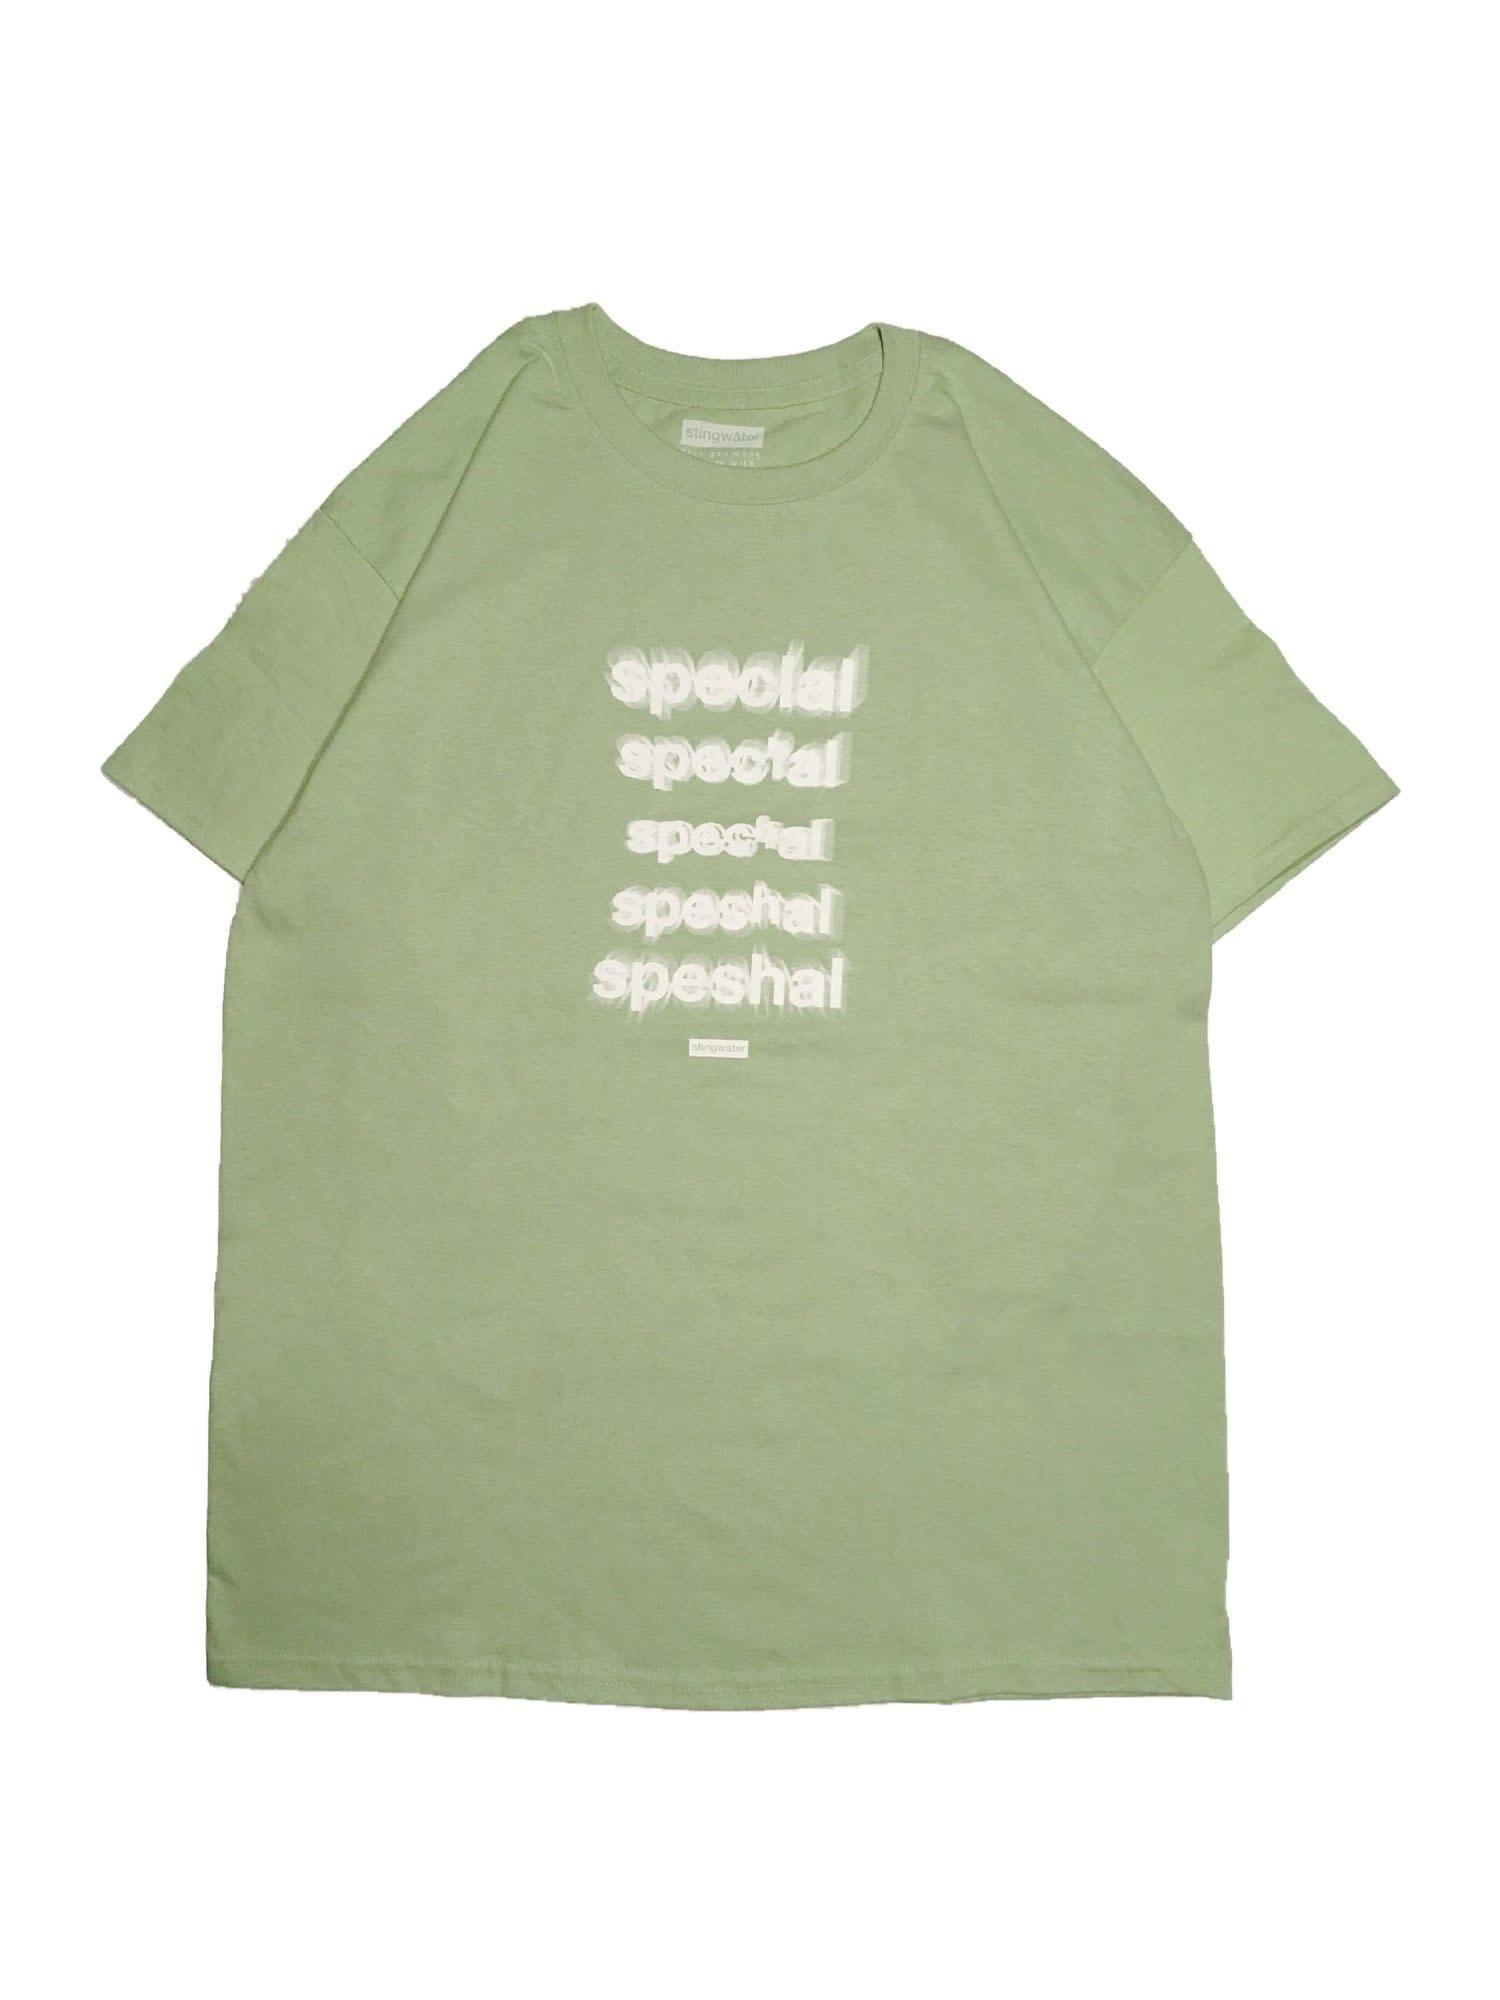 Stingwater Speshal Lime Tee